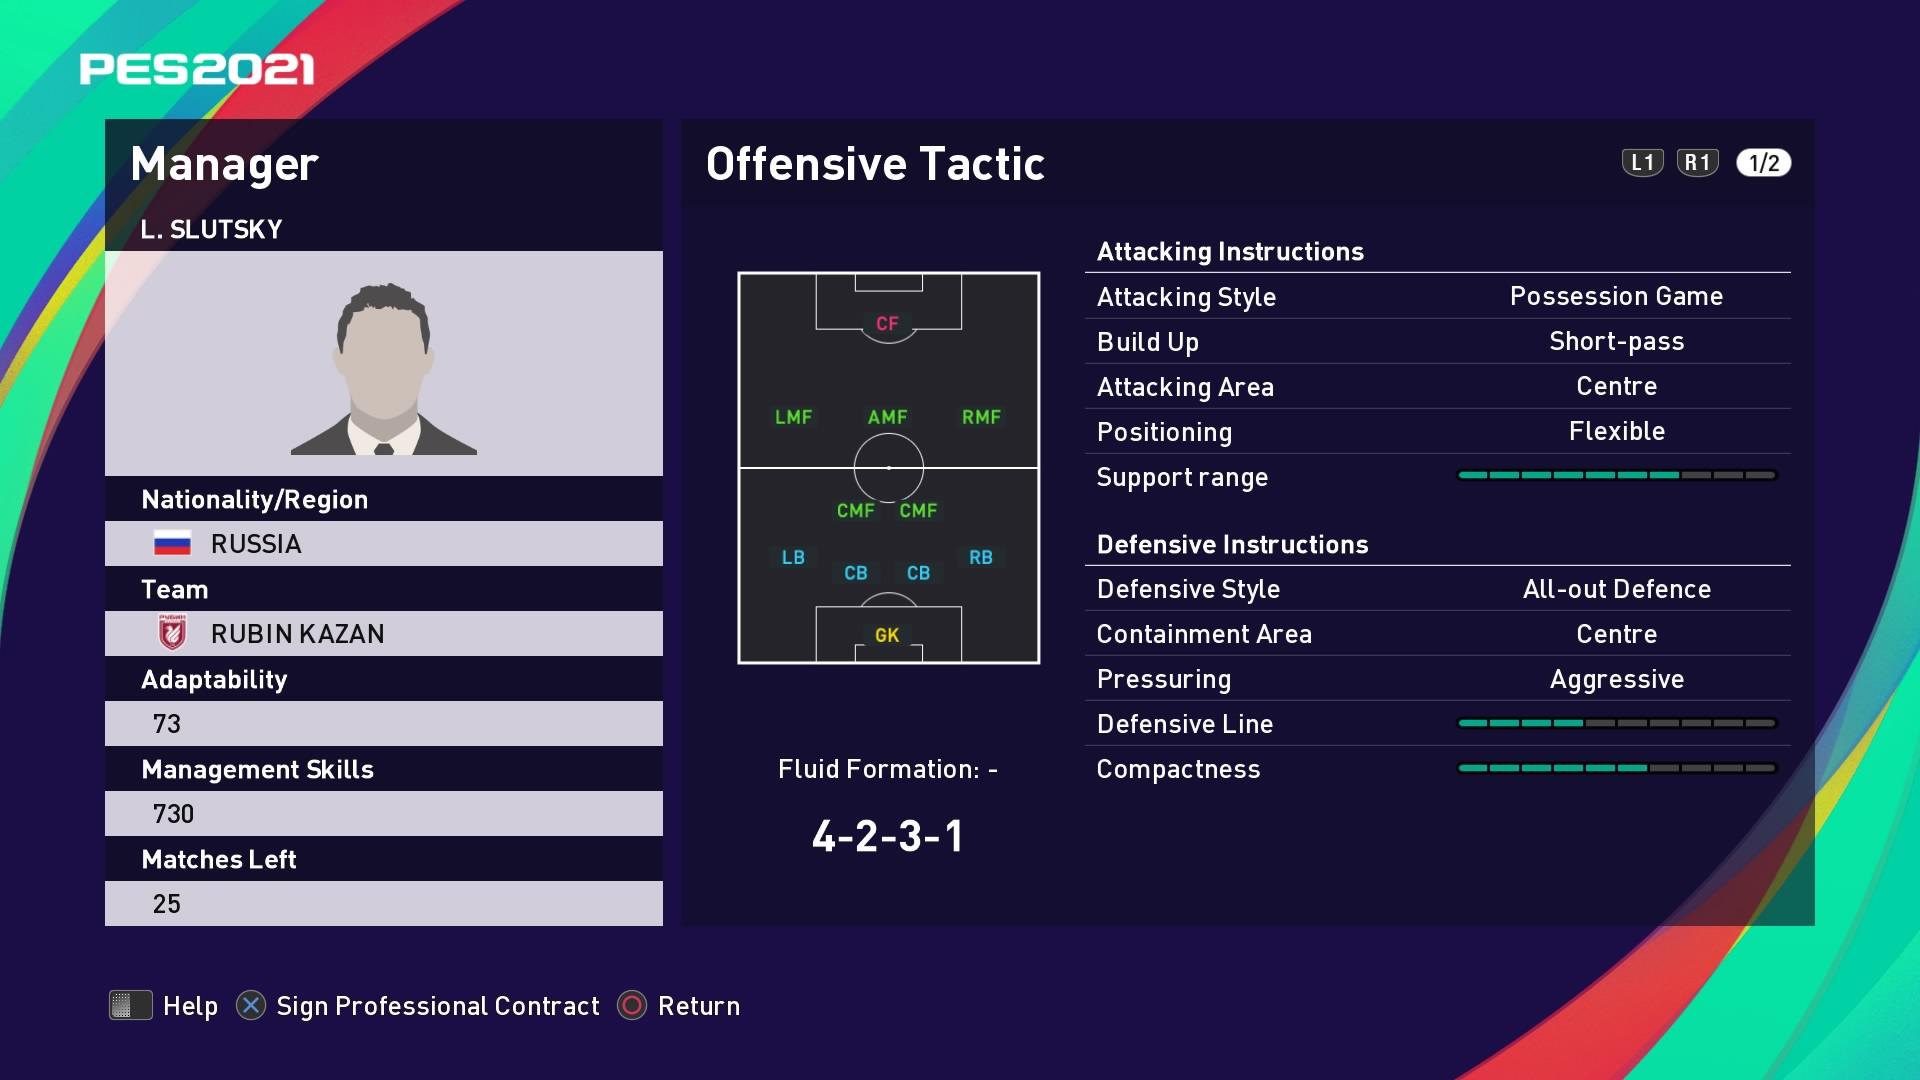 L. Slutsky (Leonid Slutsky) Offensive Tactic in PES 2021 myClub